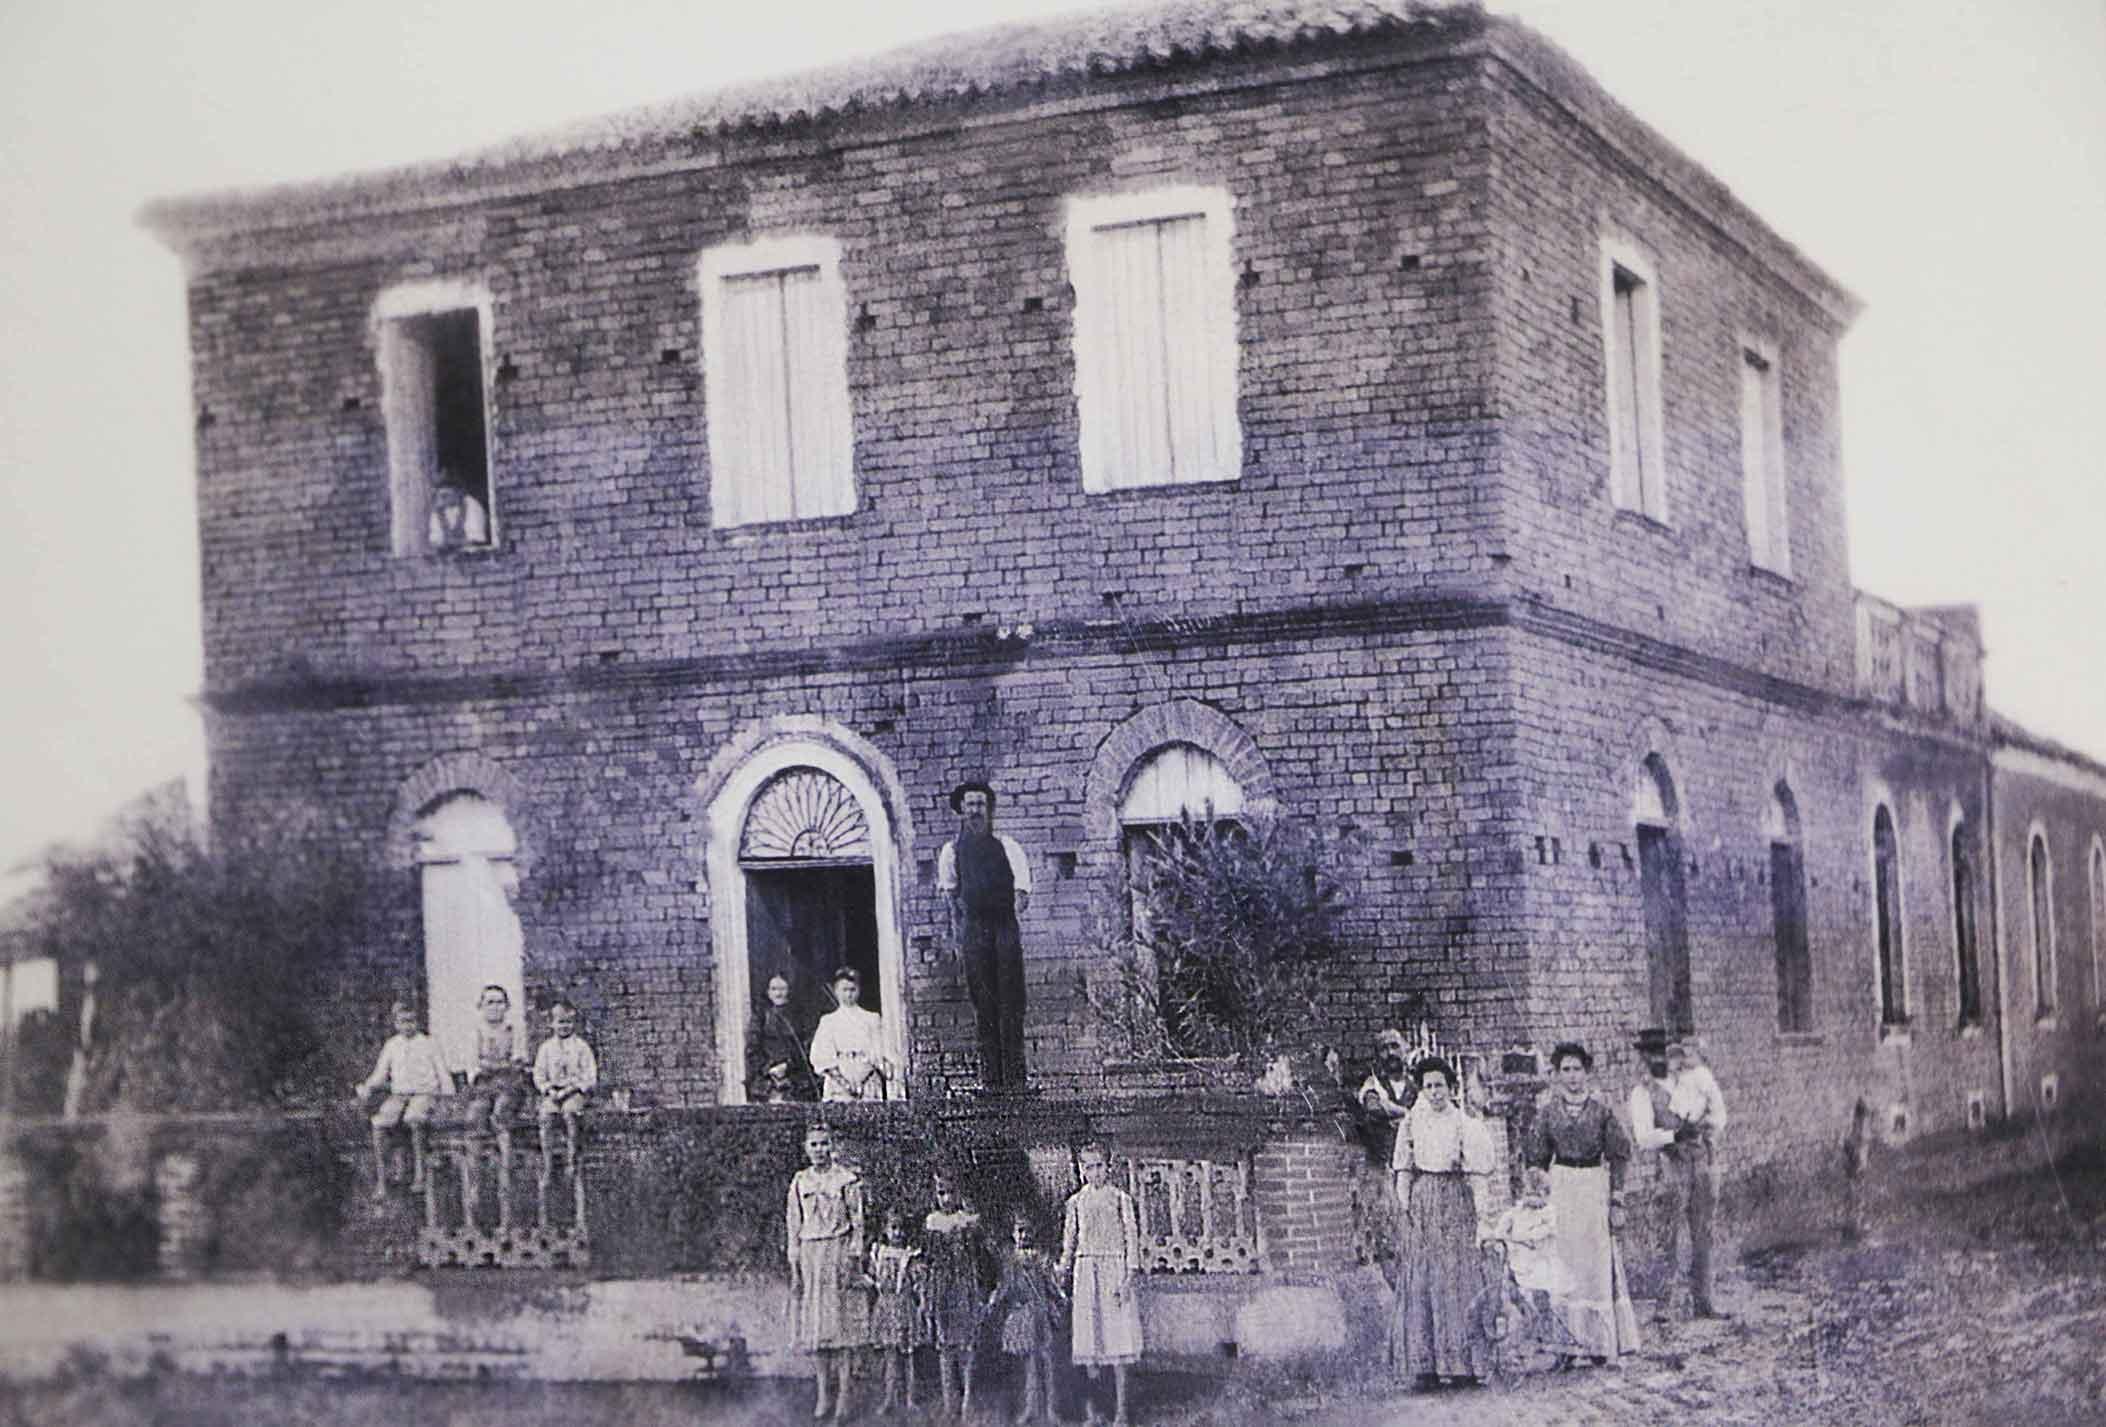 Quiririm-Historia-Museu-Indiani-_MG_8279-bx